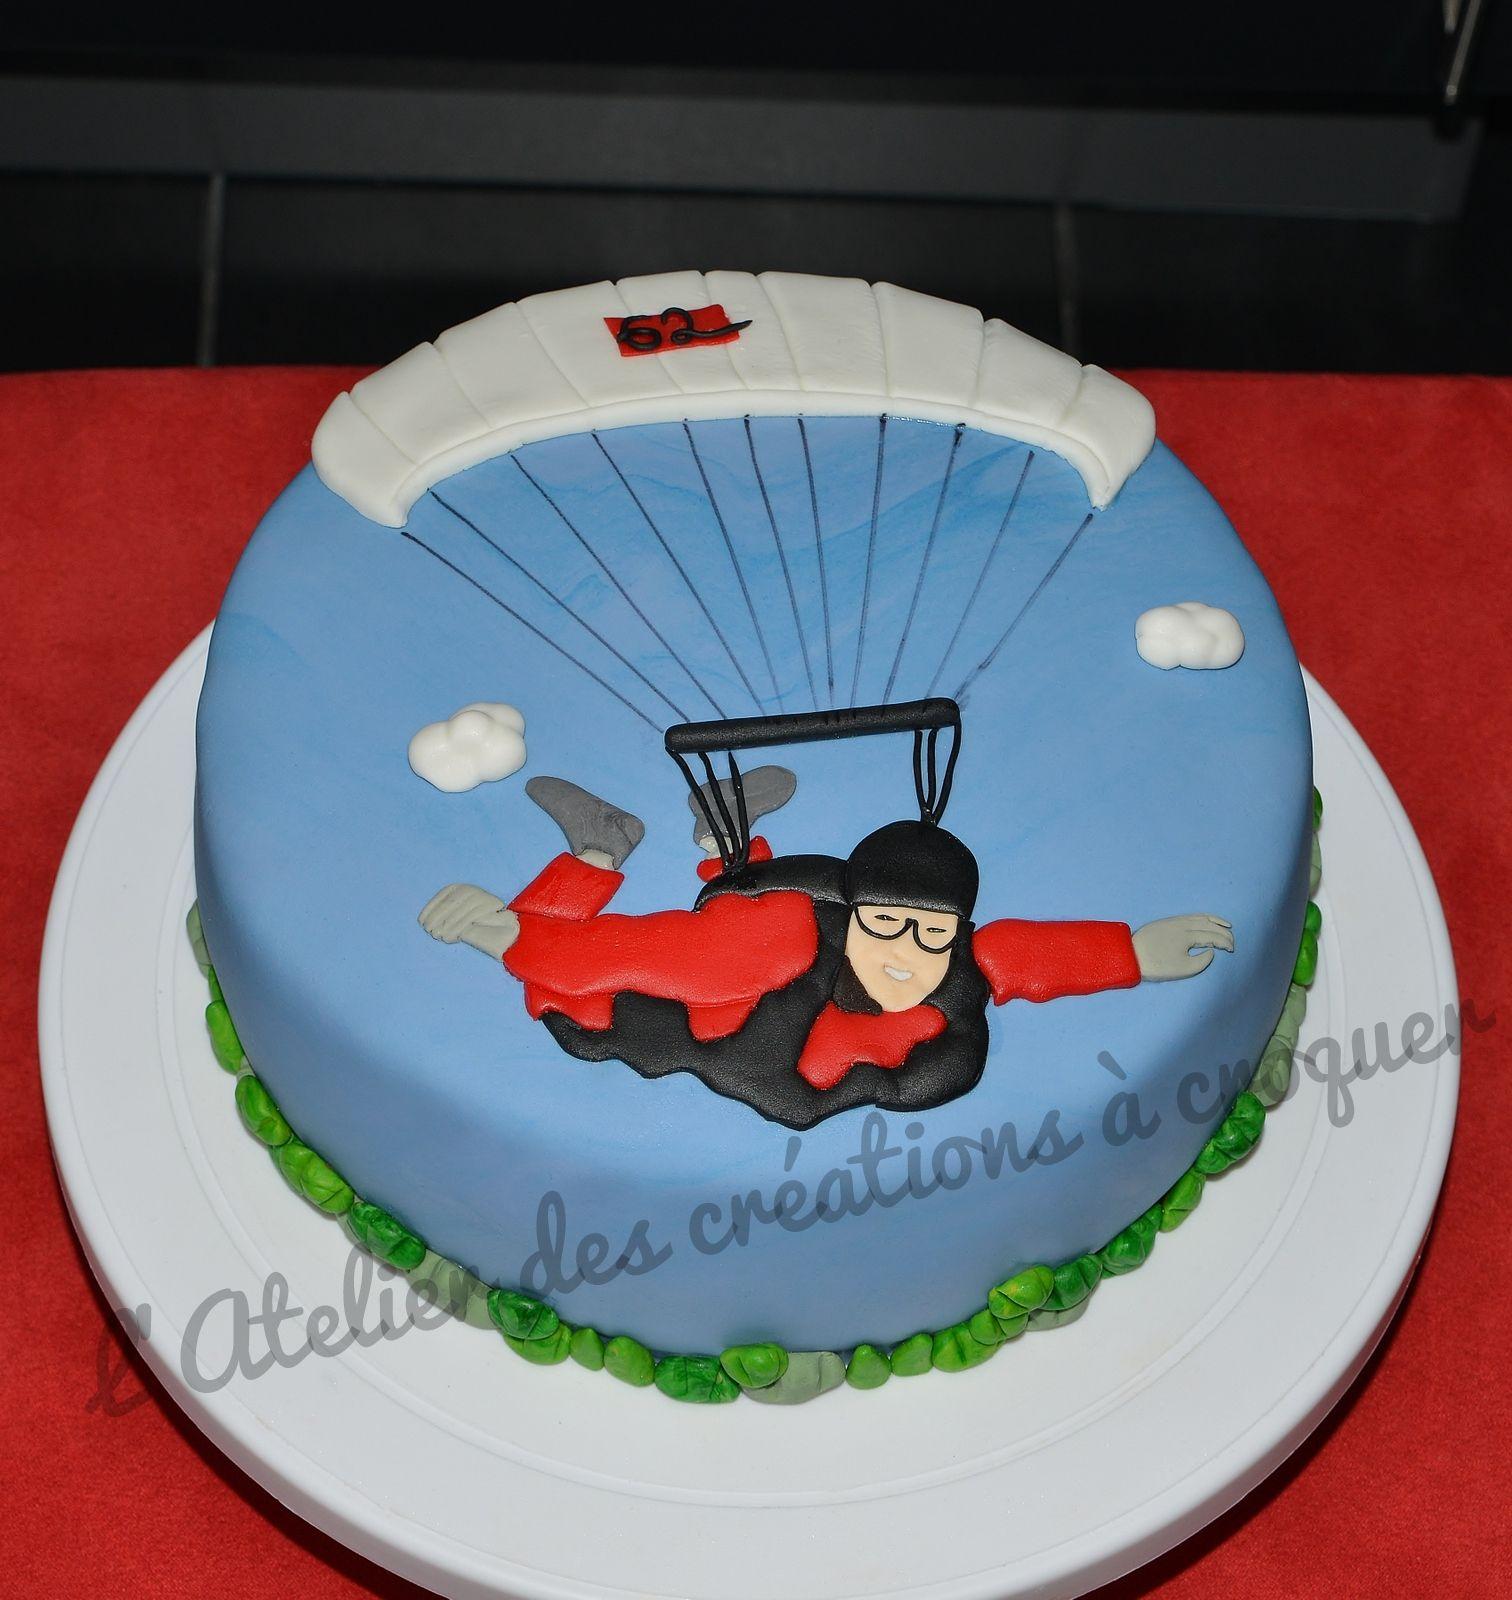 Sports/Organizations/Logos Cake